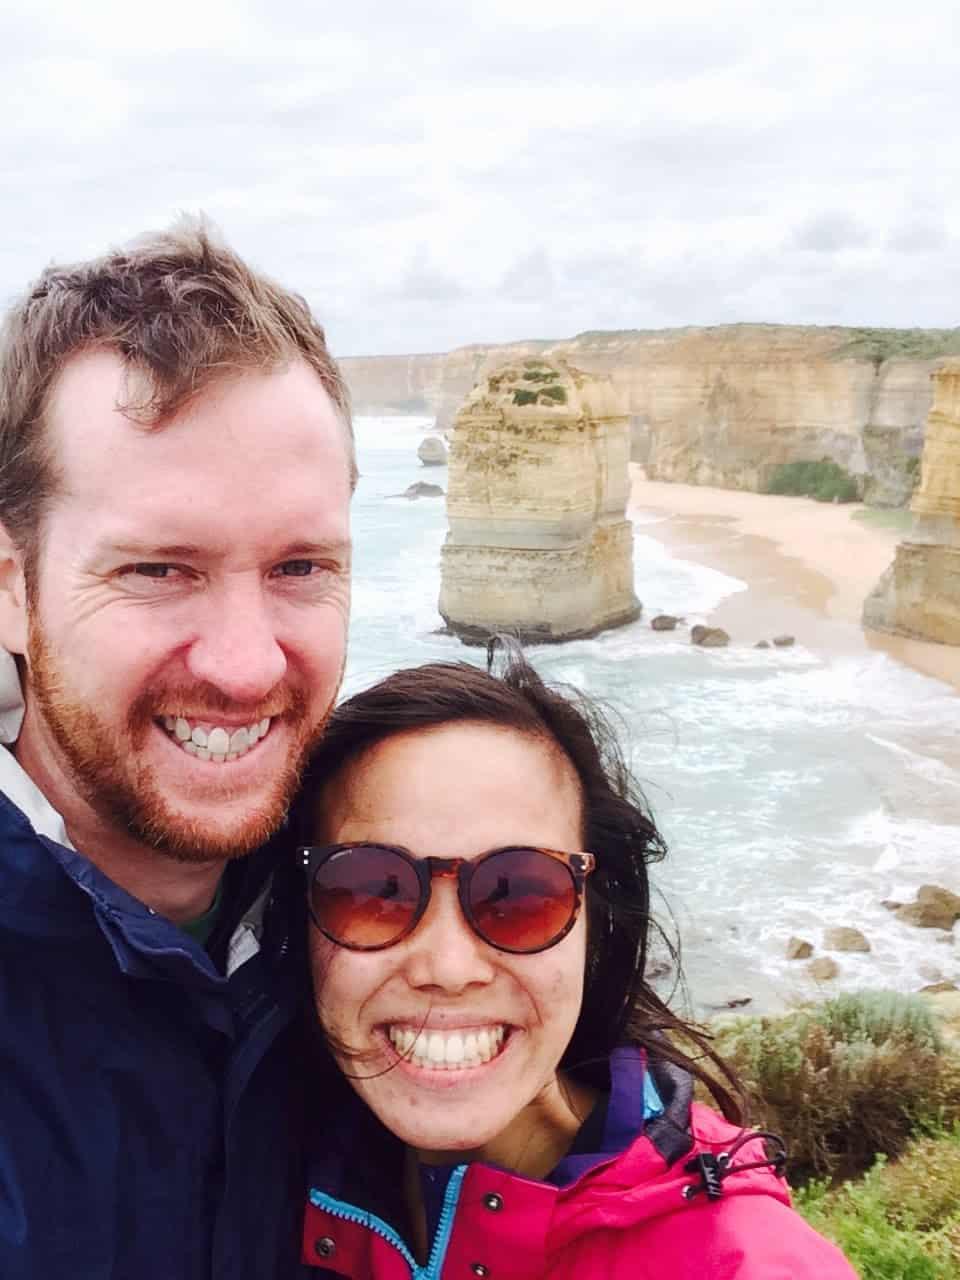 Sarah and Steve at the 12 apostles in Australia